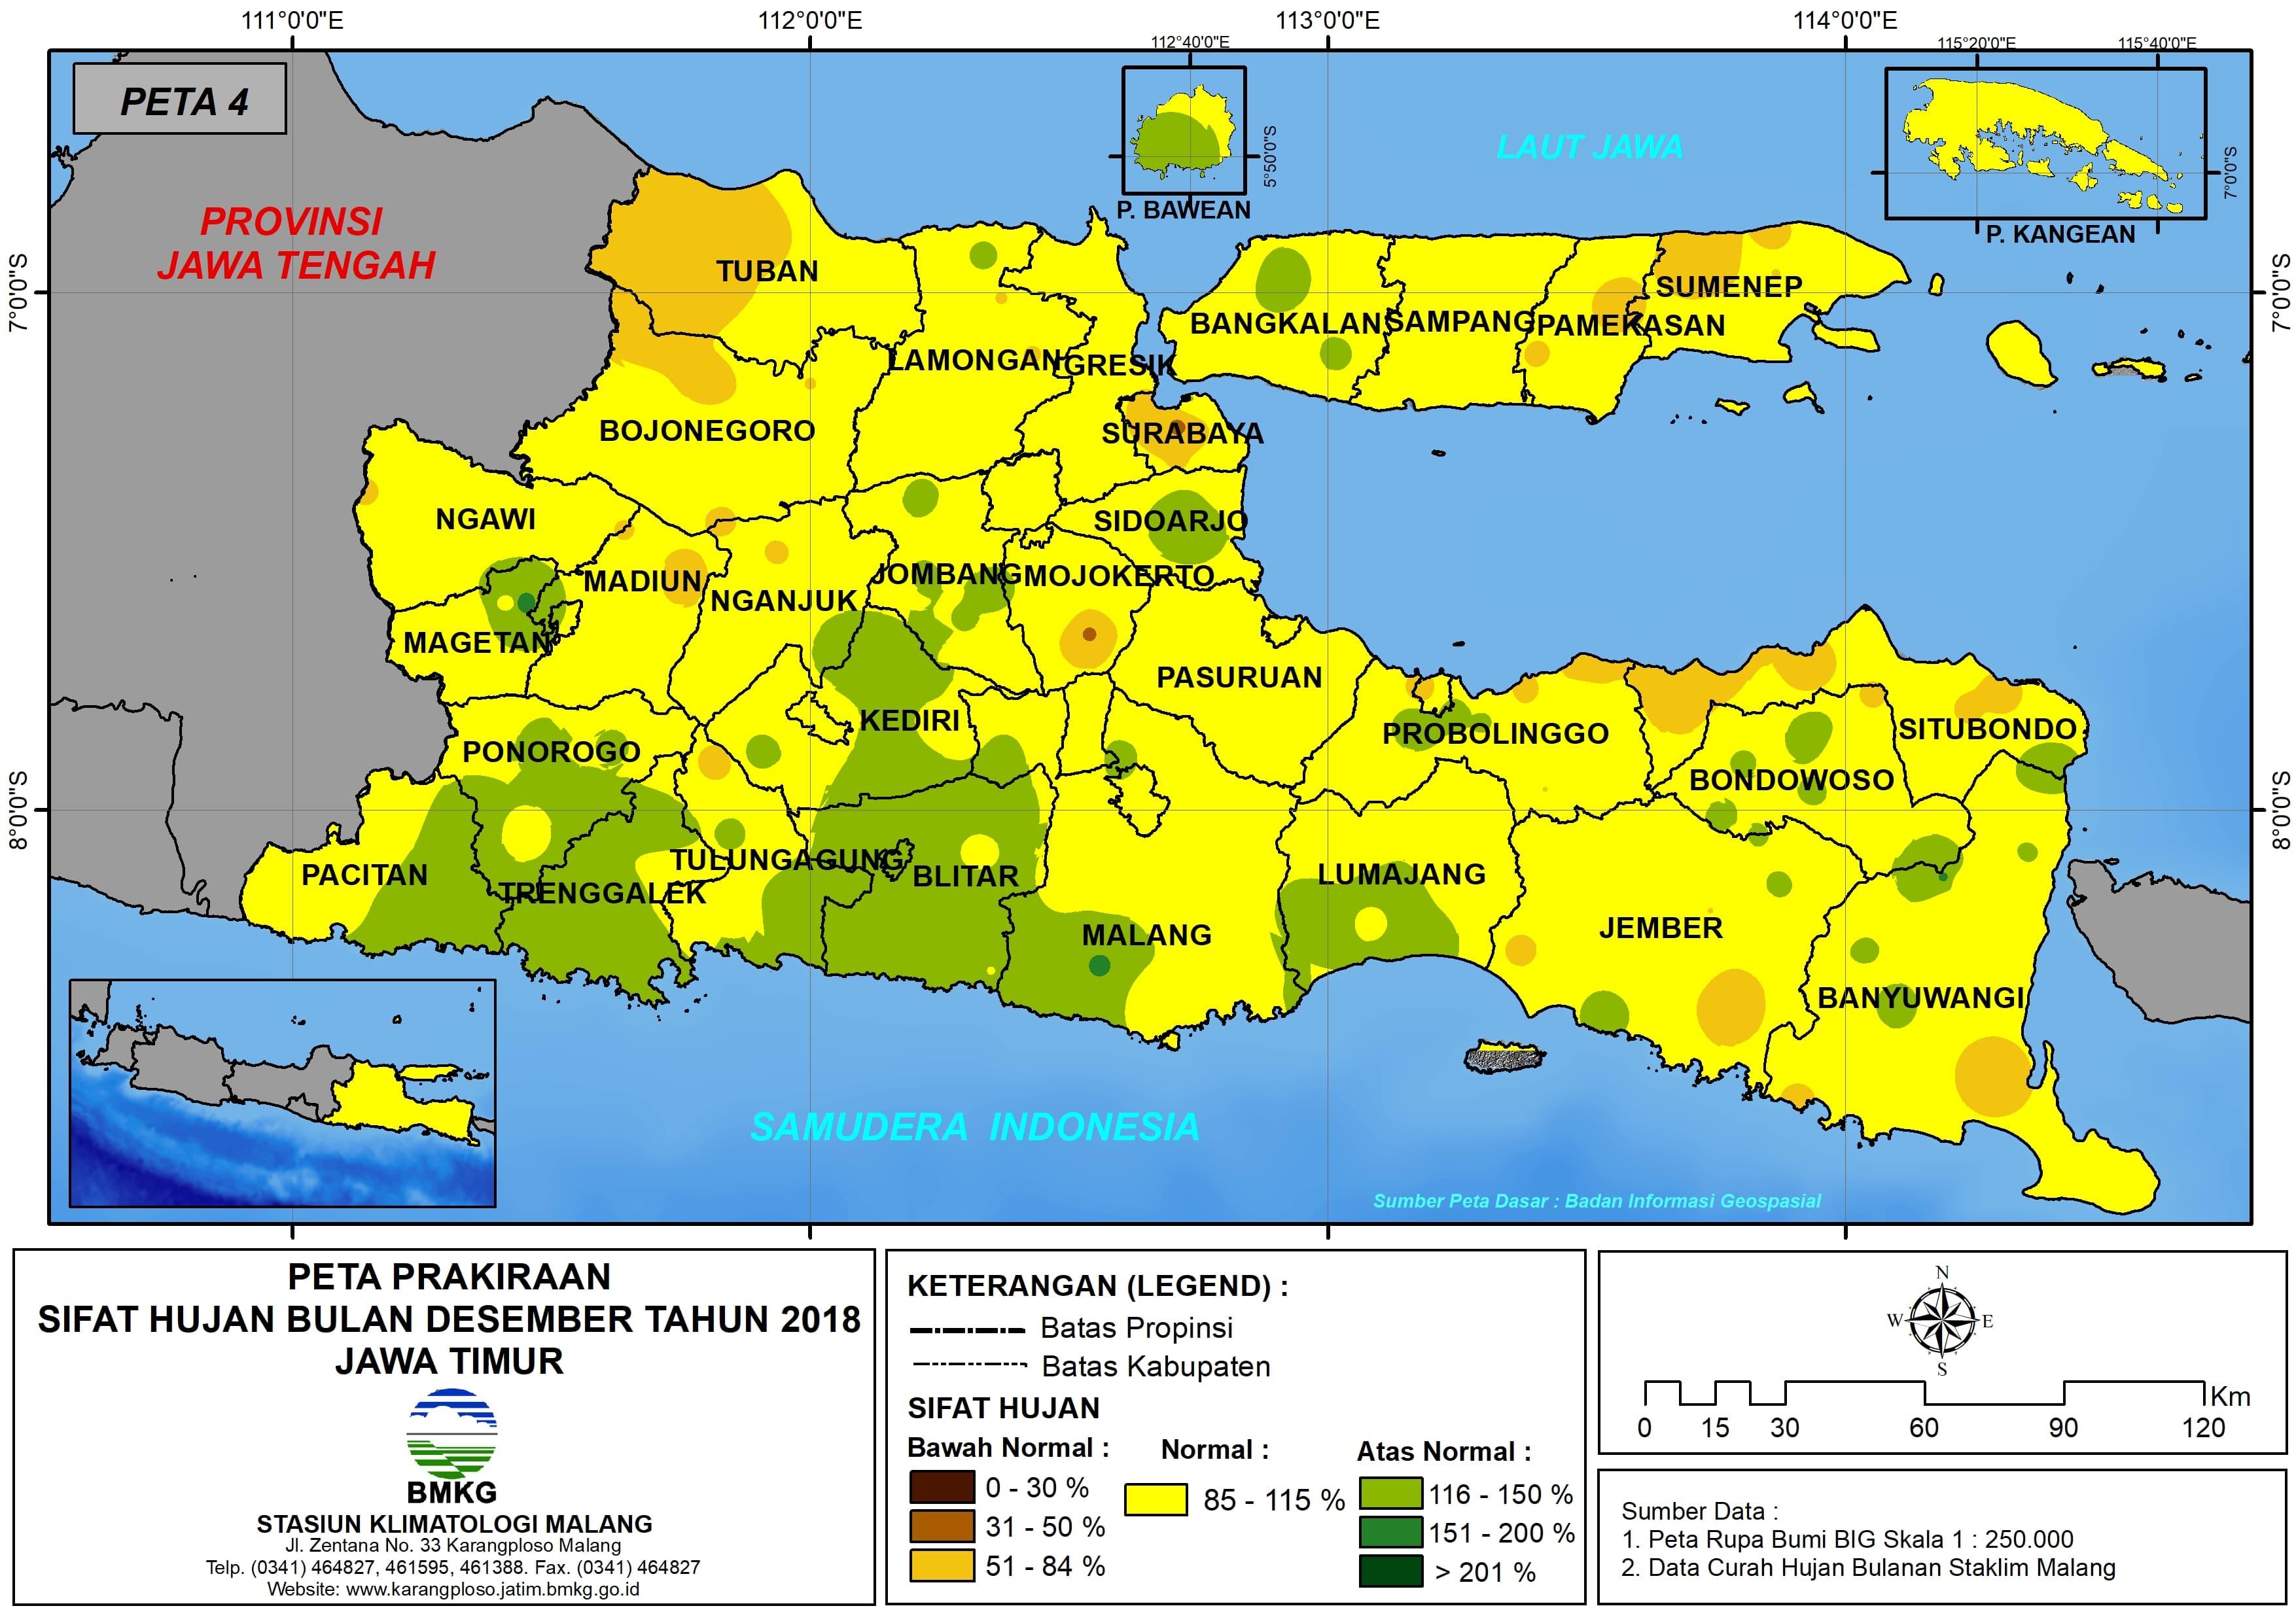 Prakiraan Sifat Hujan Bulan Desember Tahun 2018 di Provinsi Jawa Timur Update dari Analisis Bulan Oktober 2018